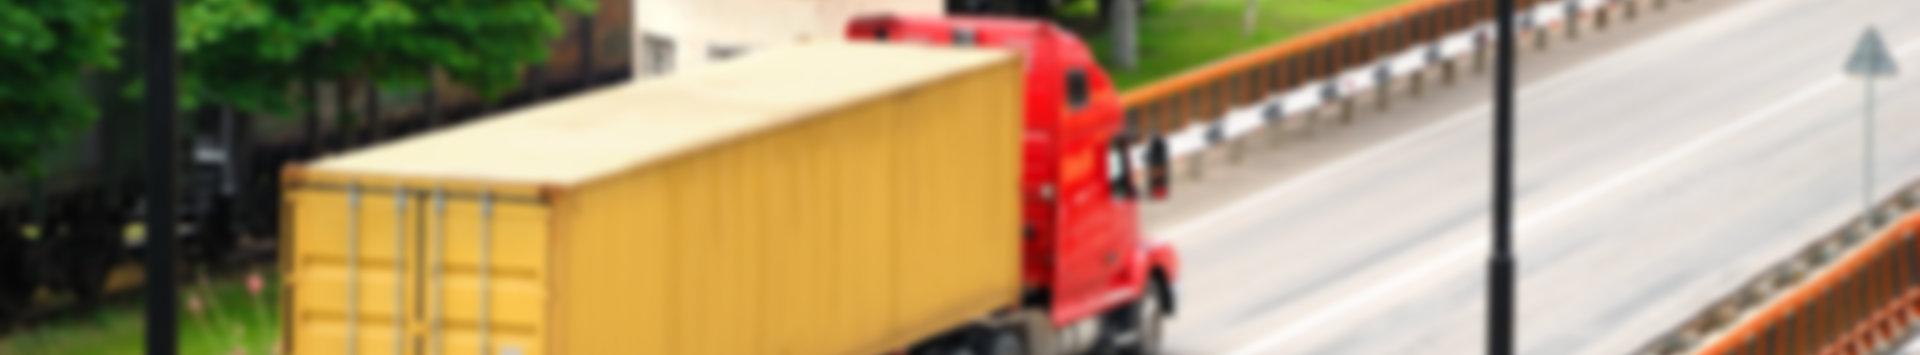 transportation of cargoes